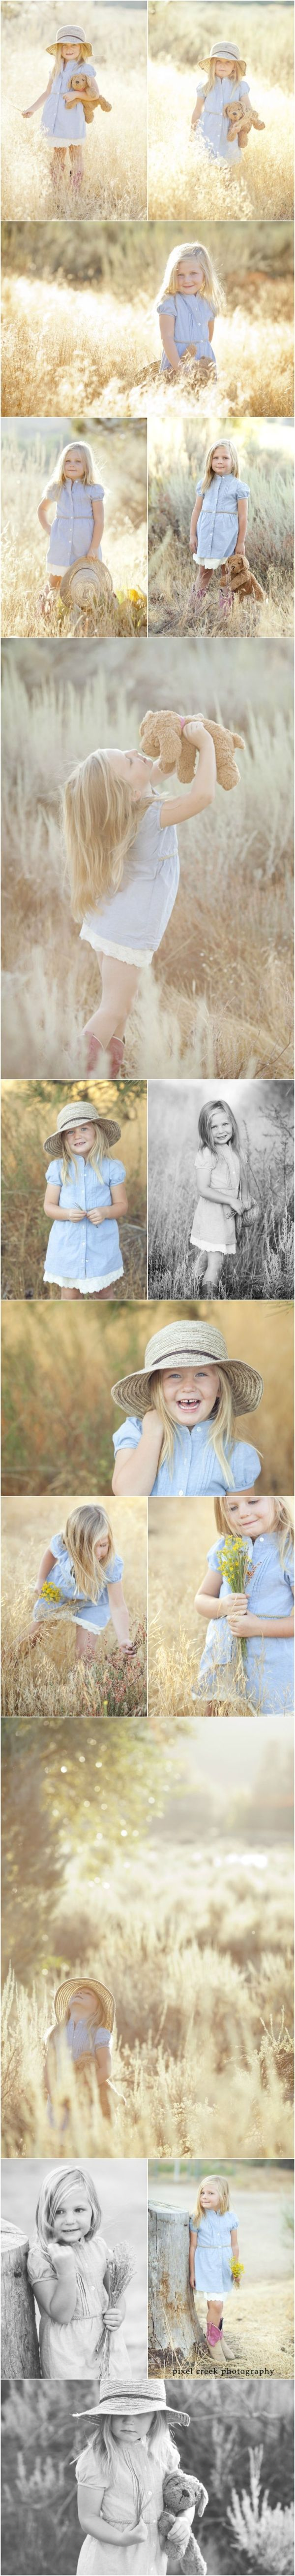 Teddy bear child Field photography